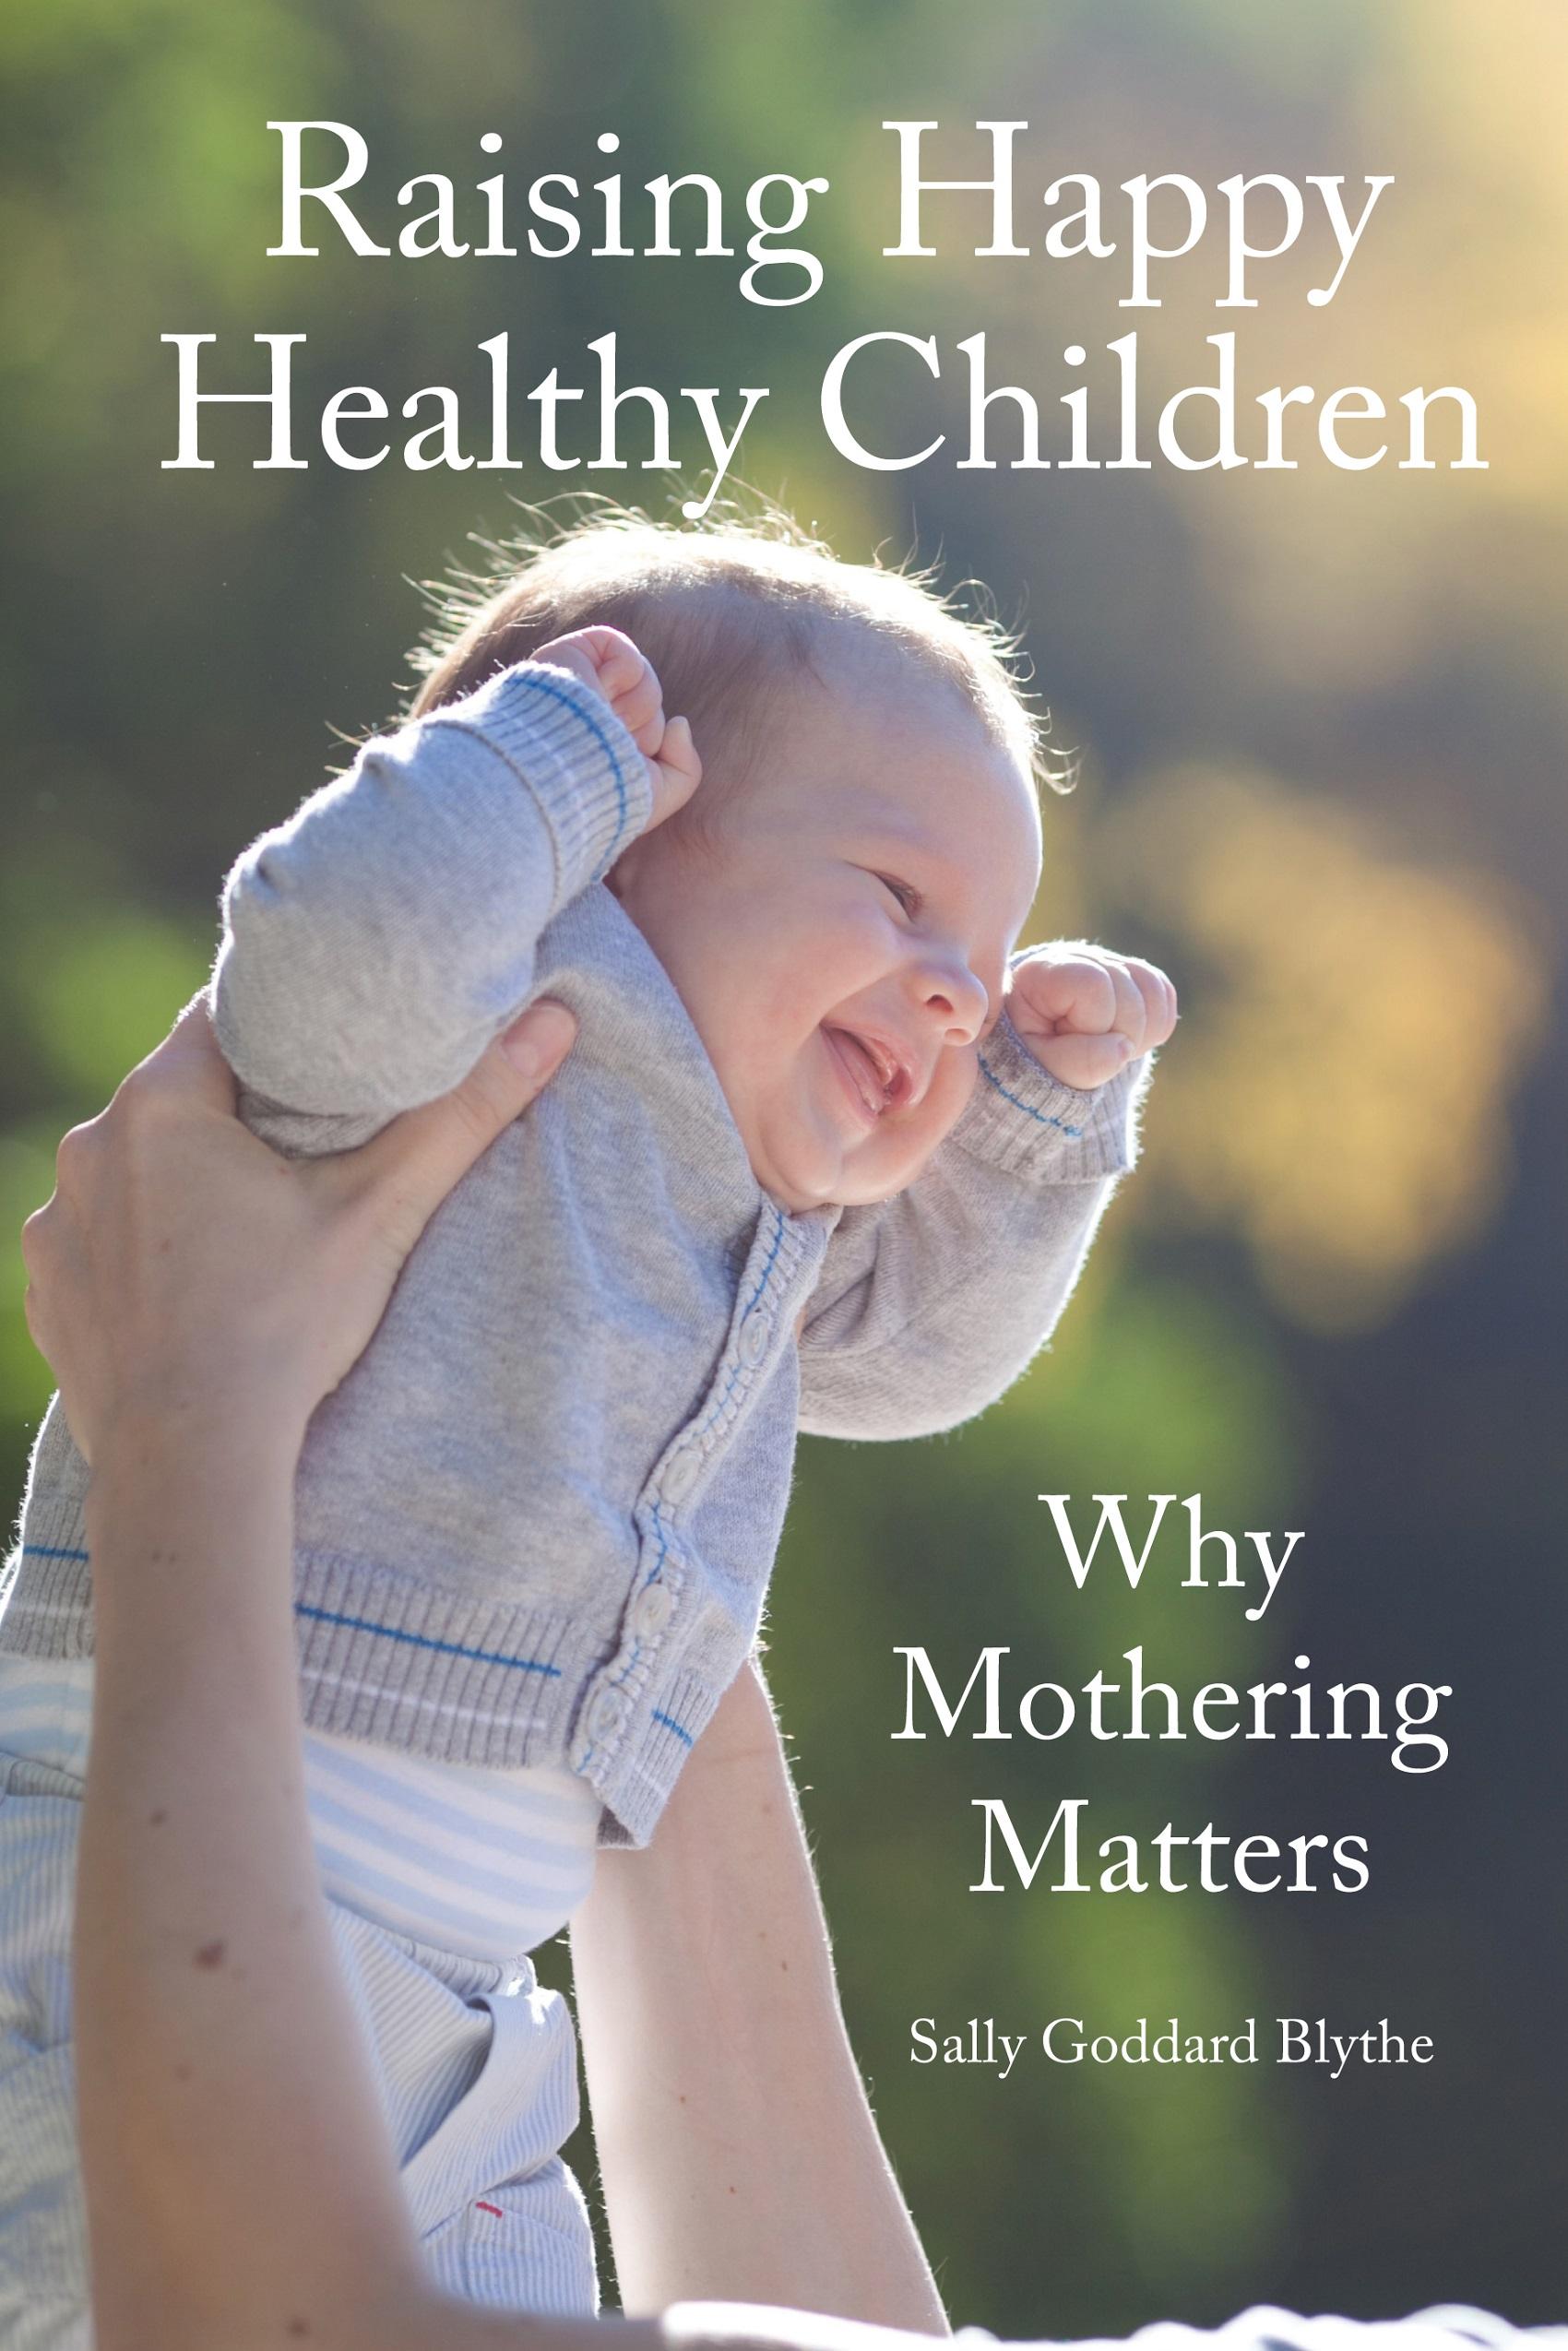 Raising Happy Healthy Children